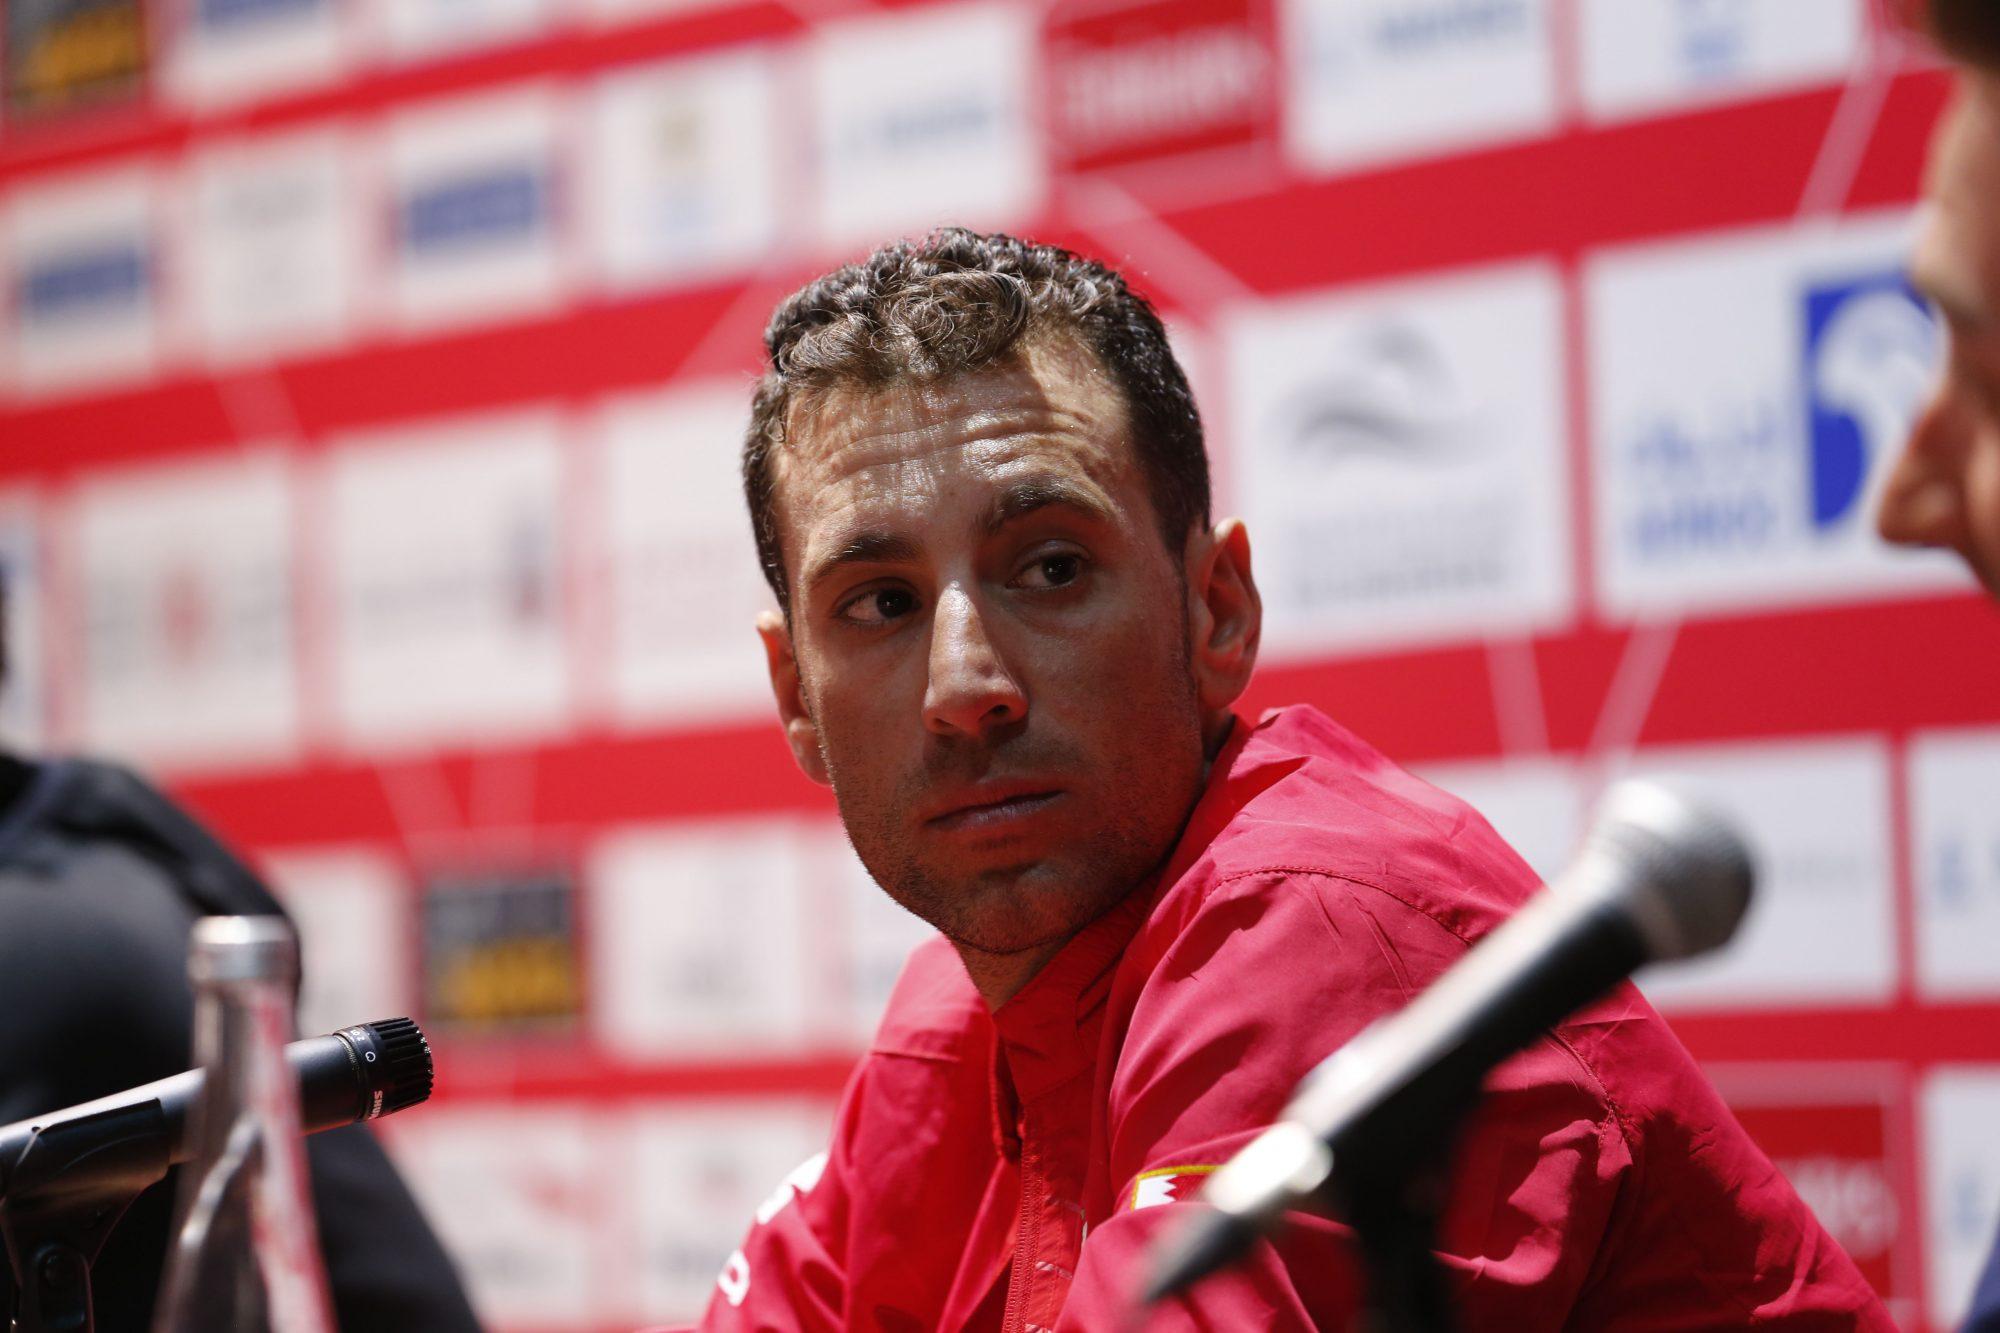 Vincenzo Nibali set to make Trek-Segafredo switch in 2020